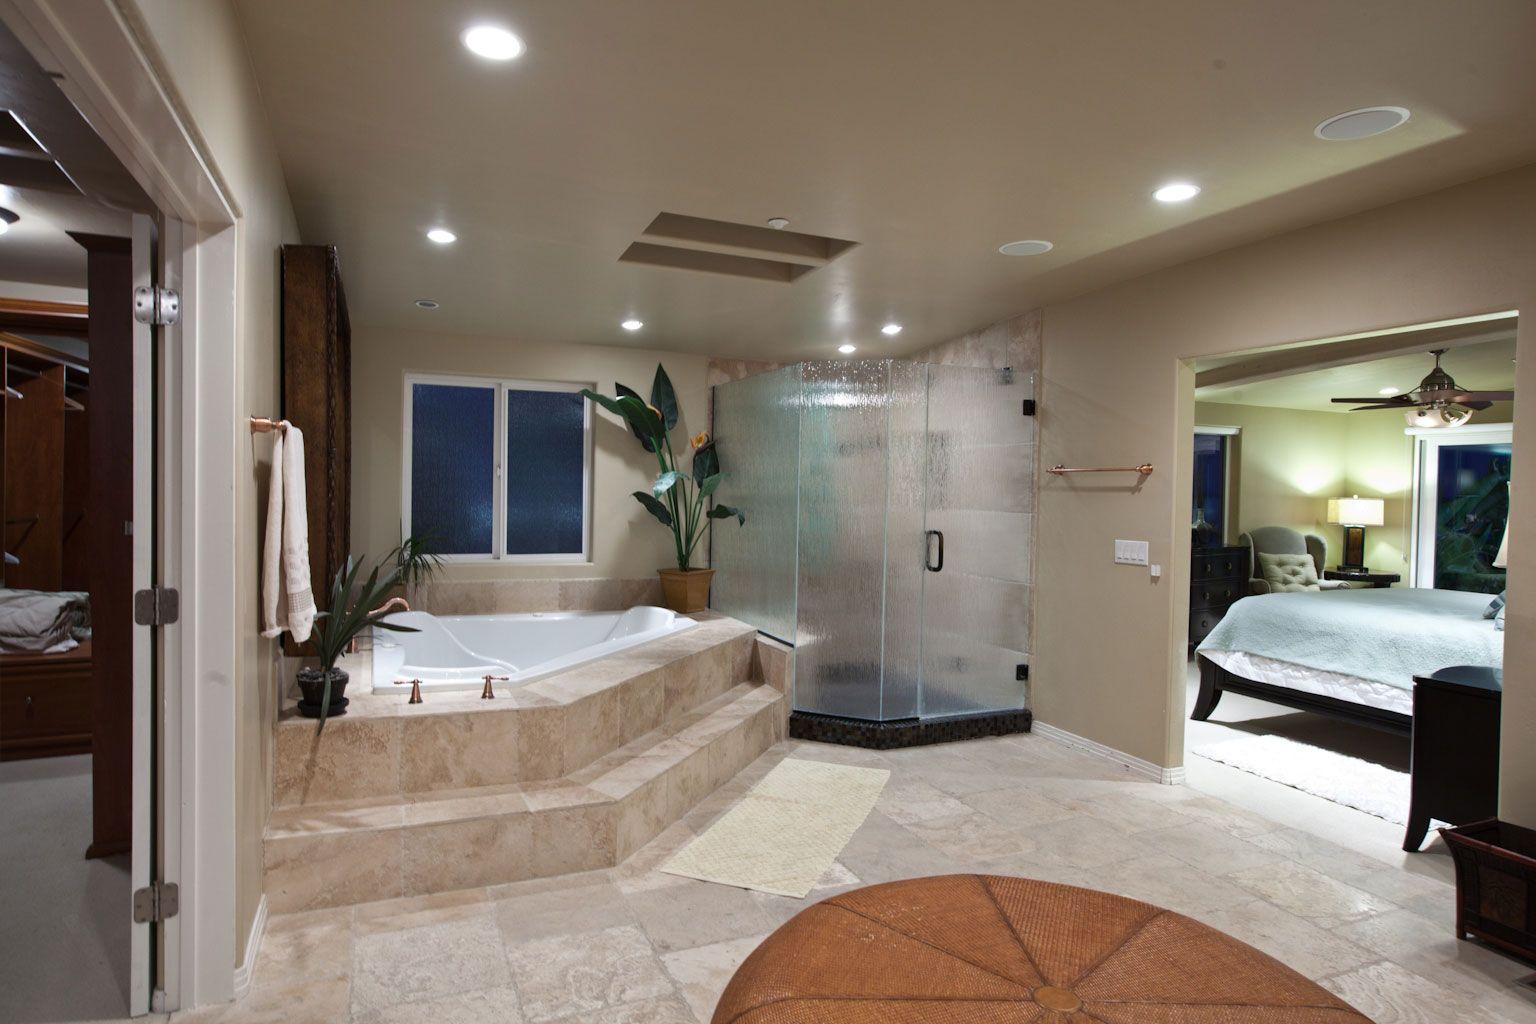 Appealing-master-bathroom-designs-with-corner-whirlpool ...